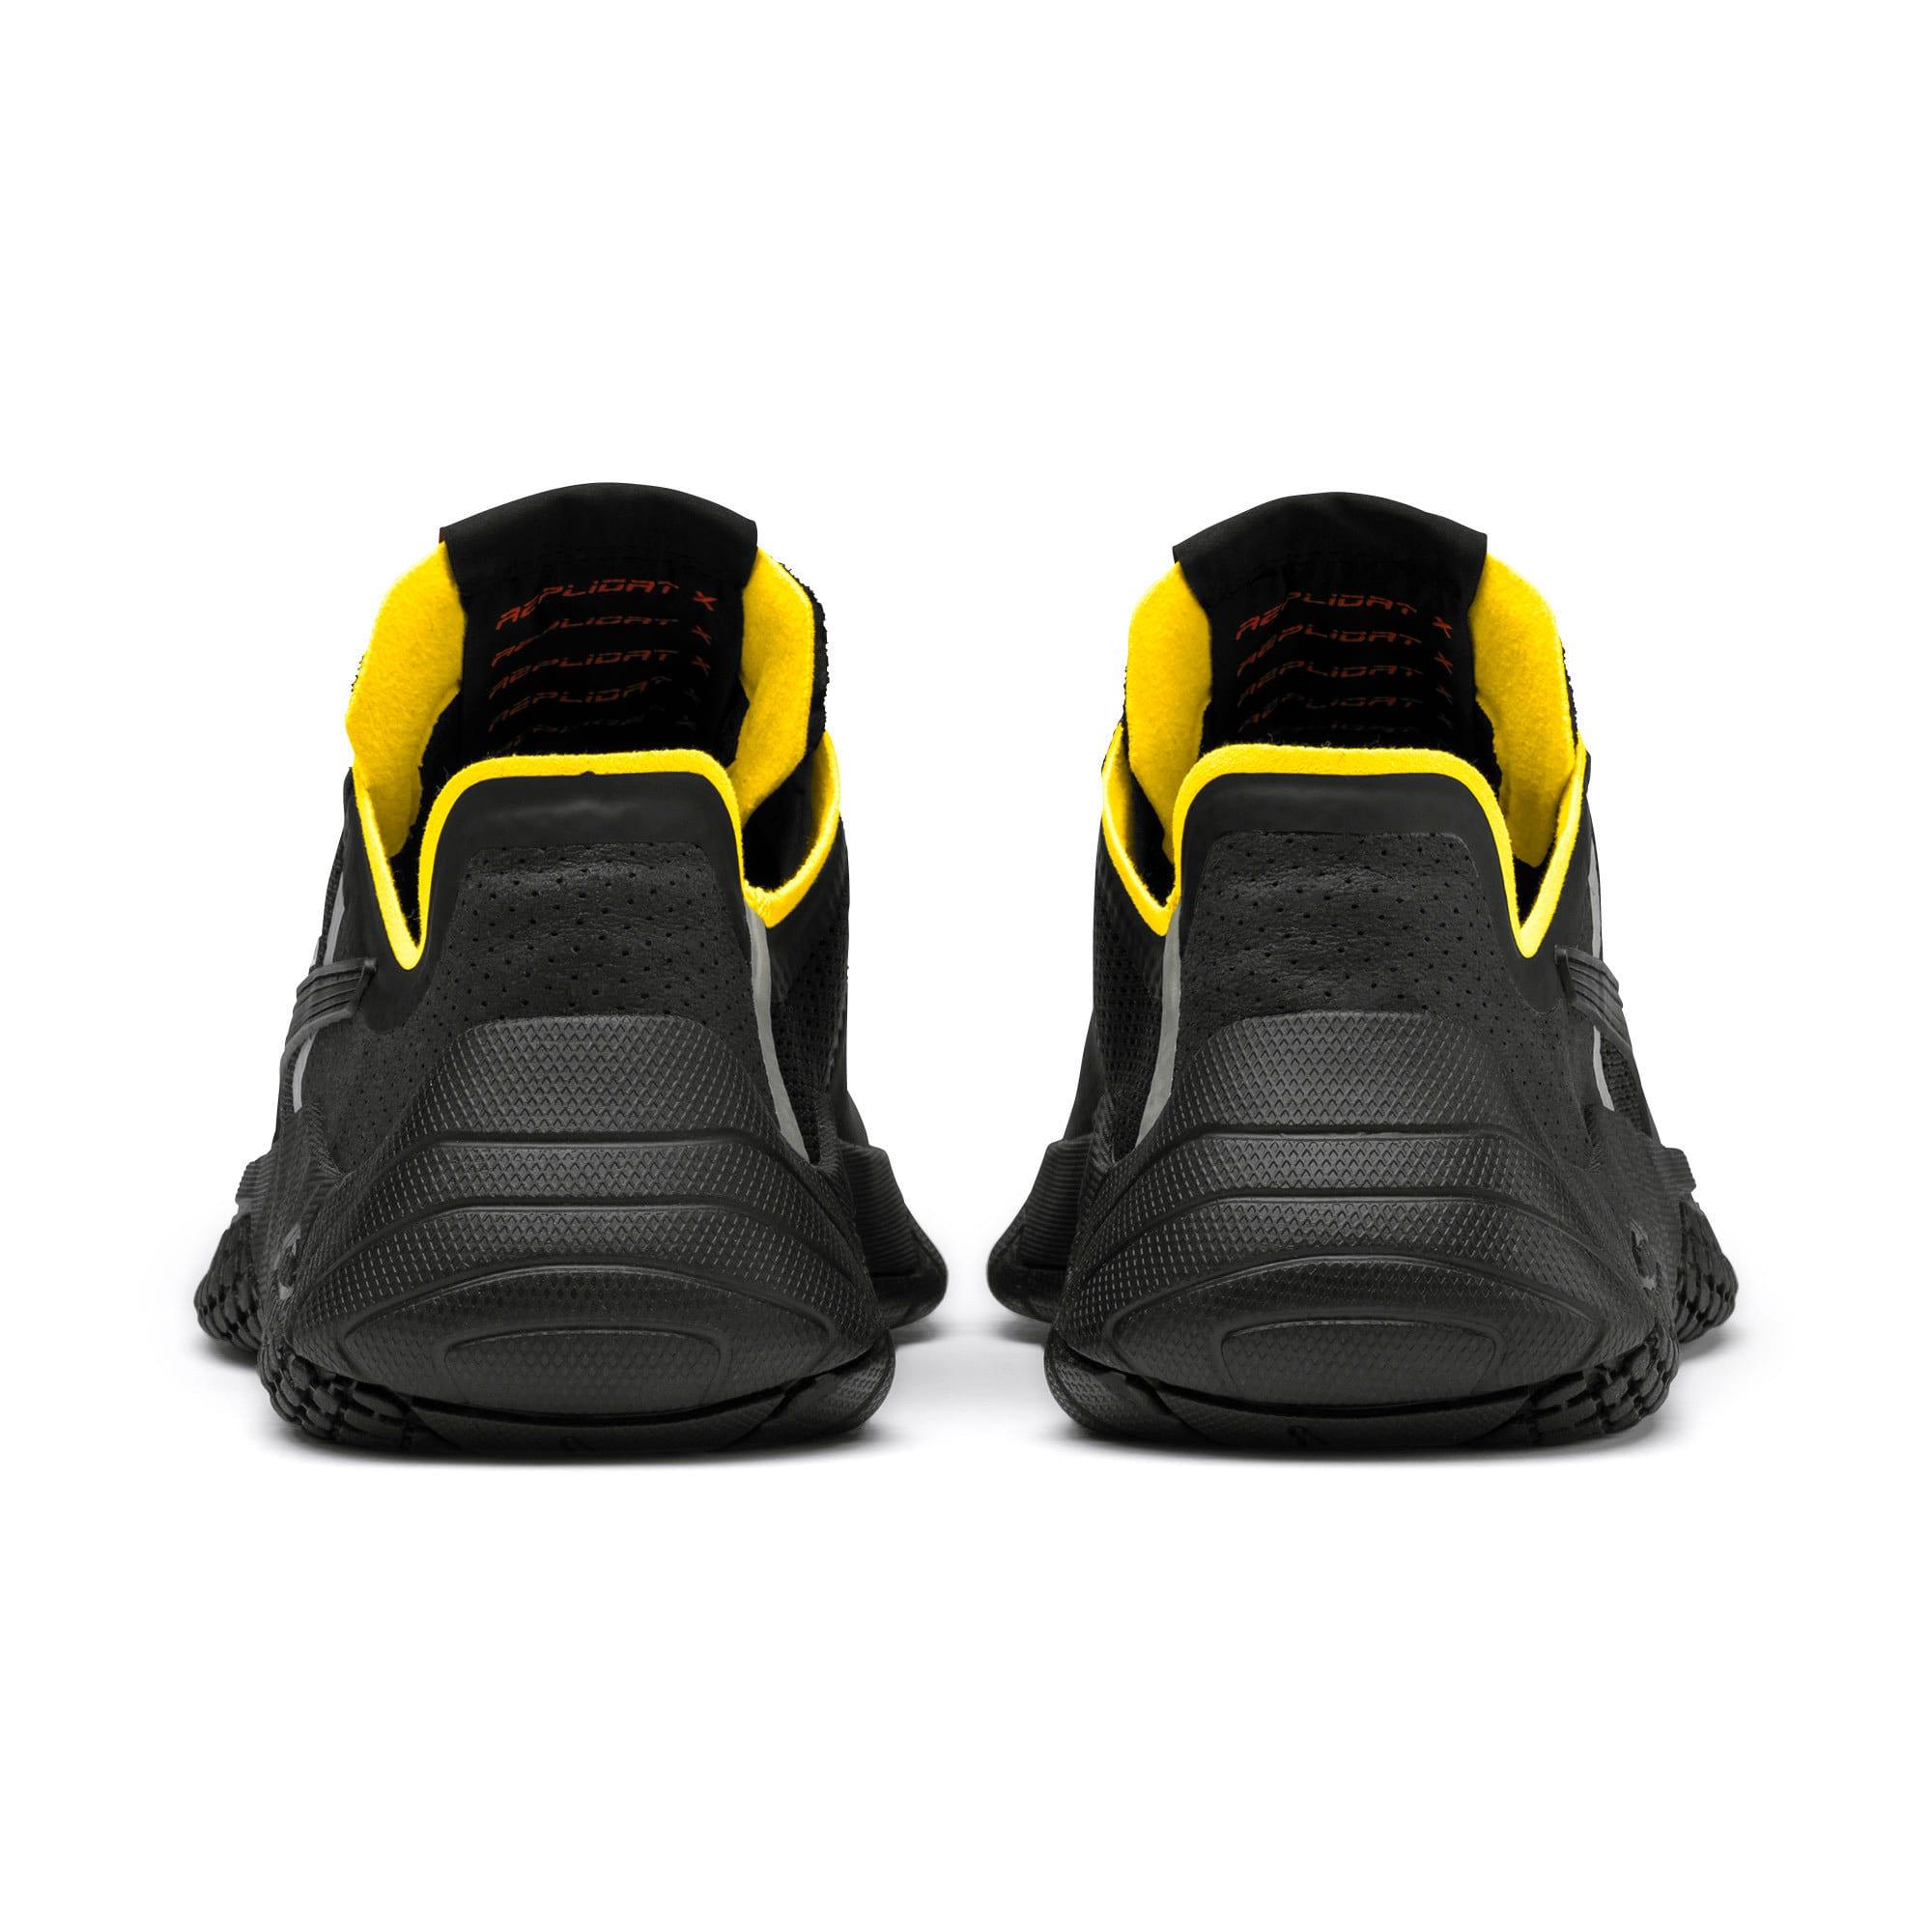 Thumbnail 3 of Replicat-X Pirelli Motorsport Shoes, Black-Black-Cyber Yellow, medium